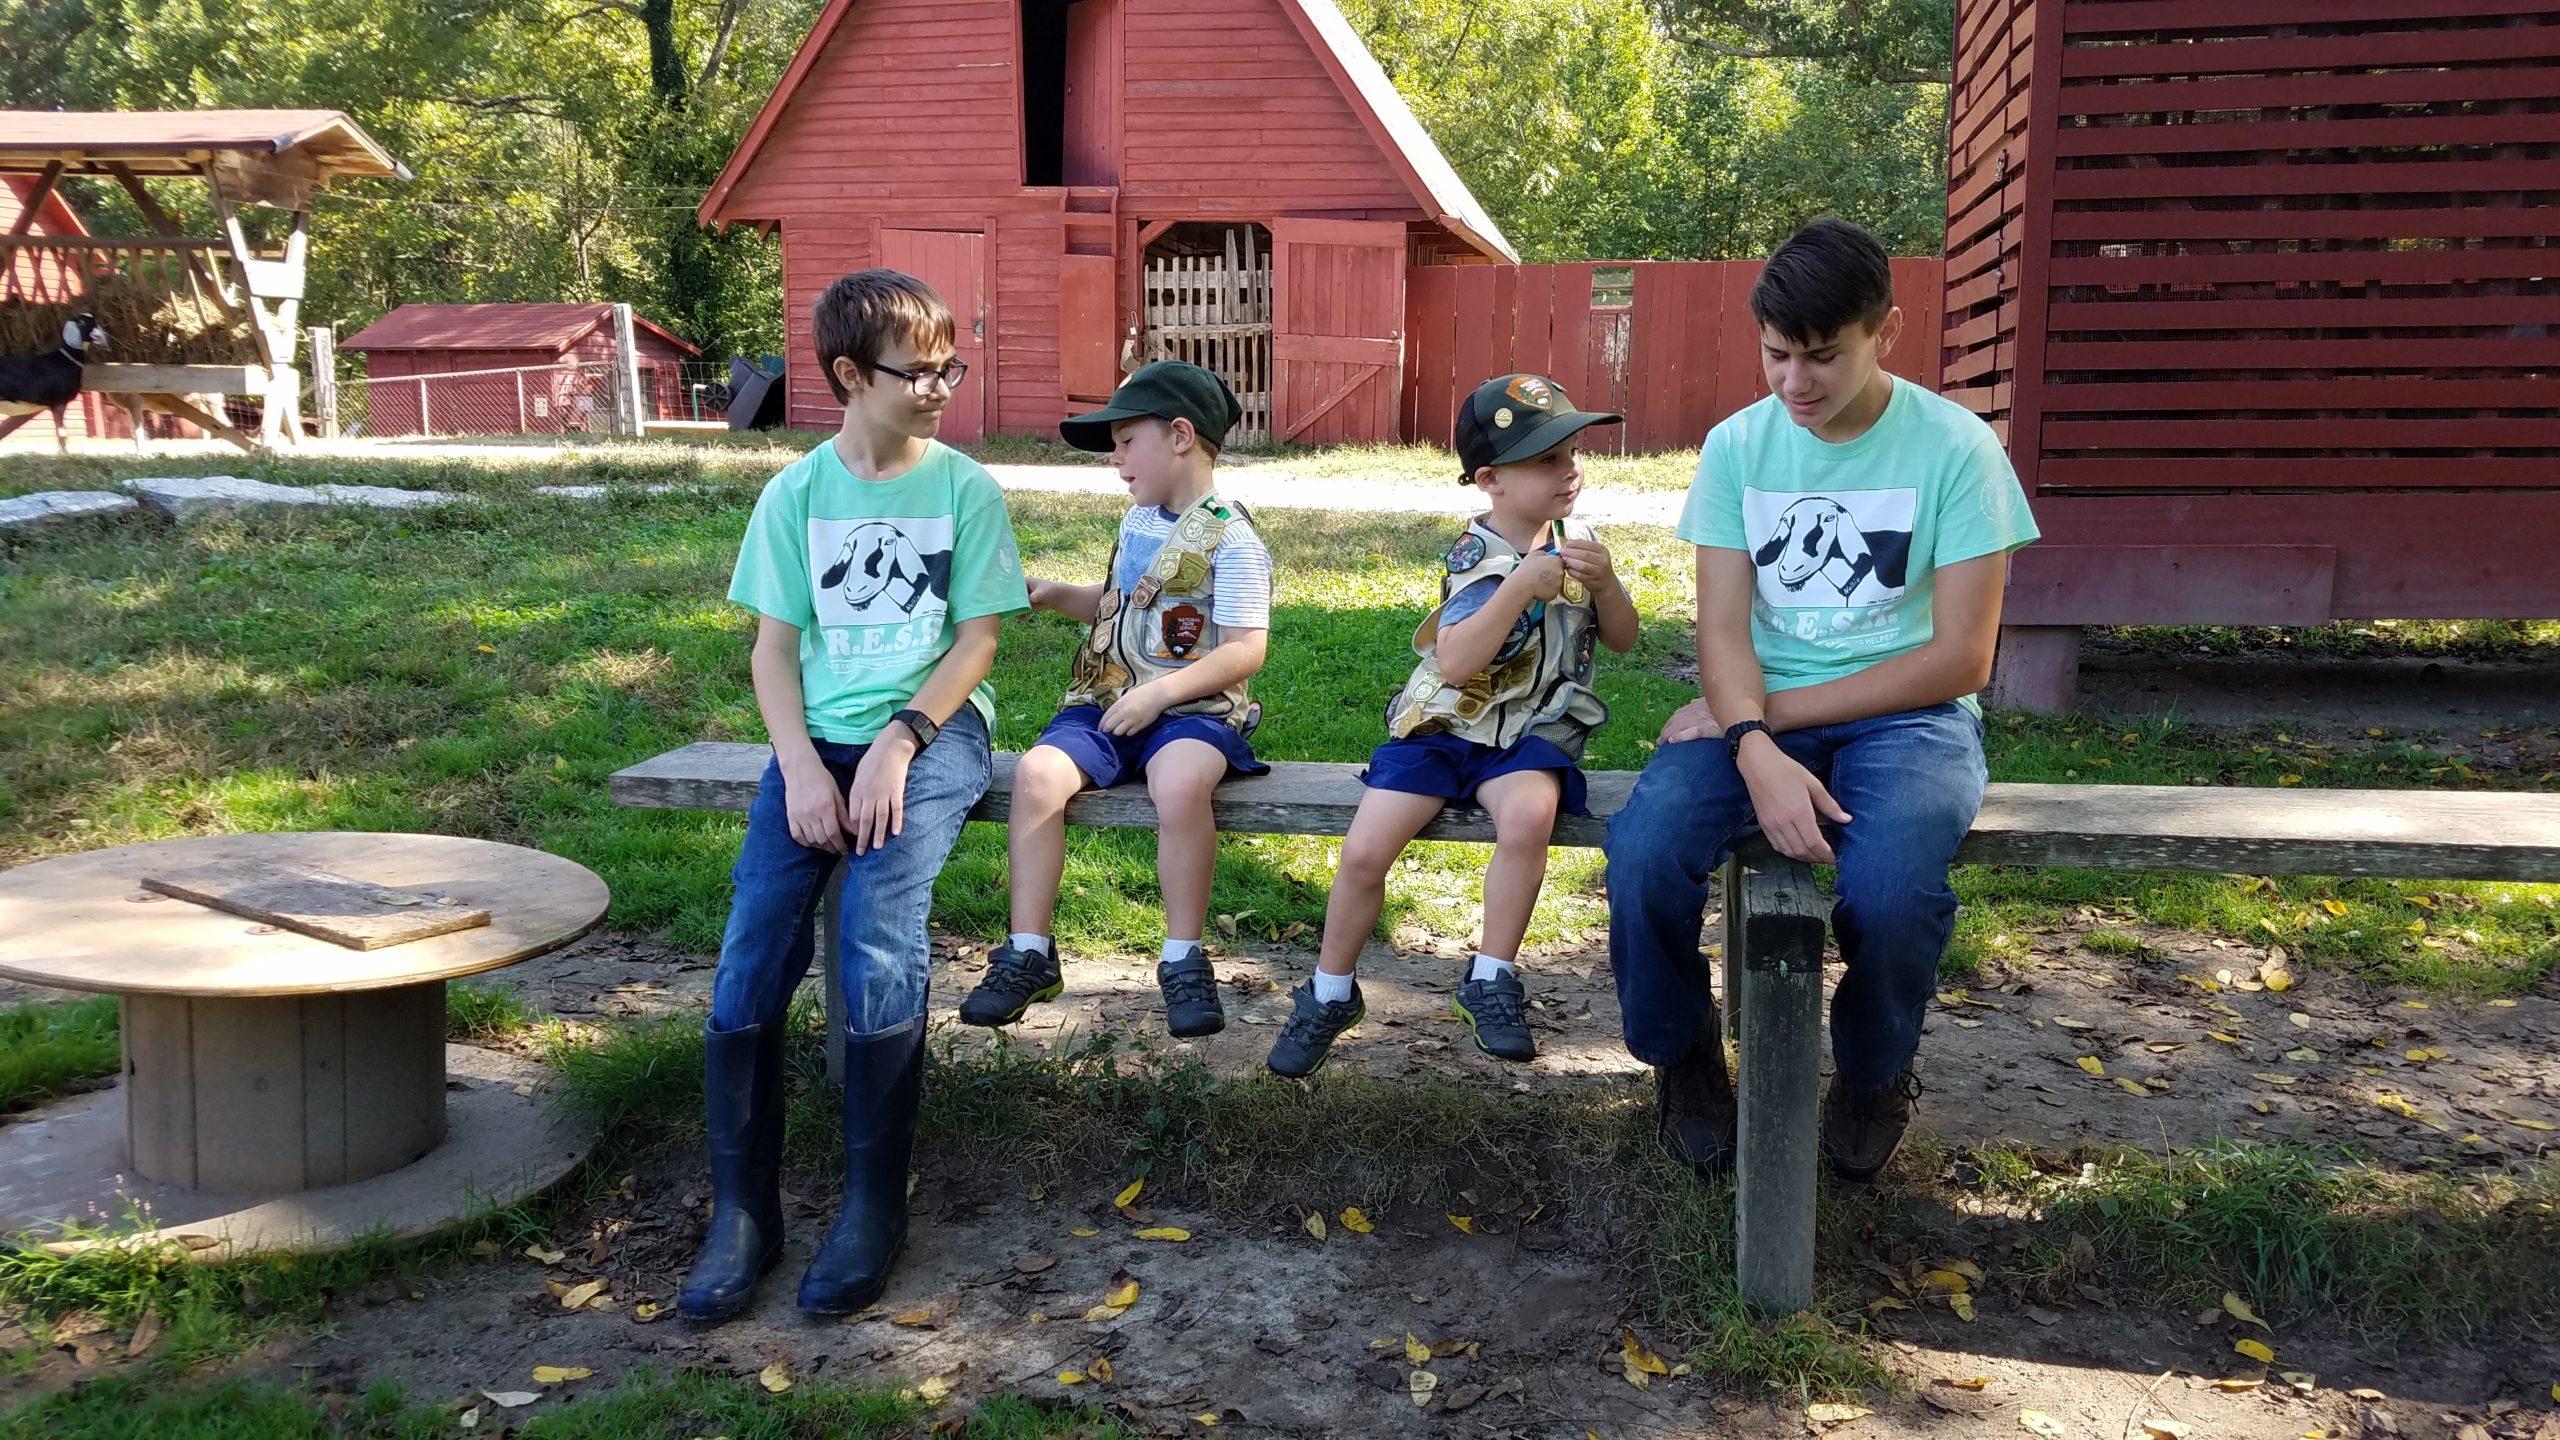 Carl Sandburg Home National Historic Site children at goat barn